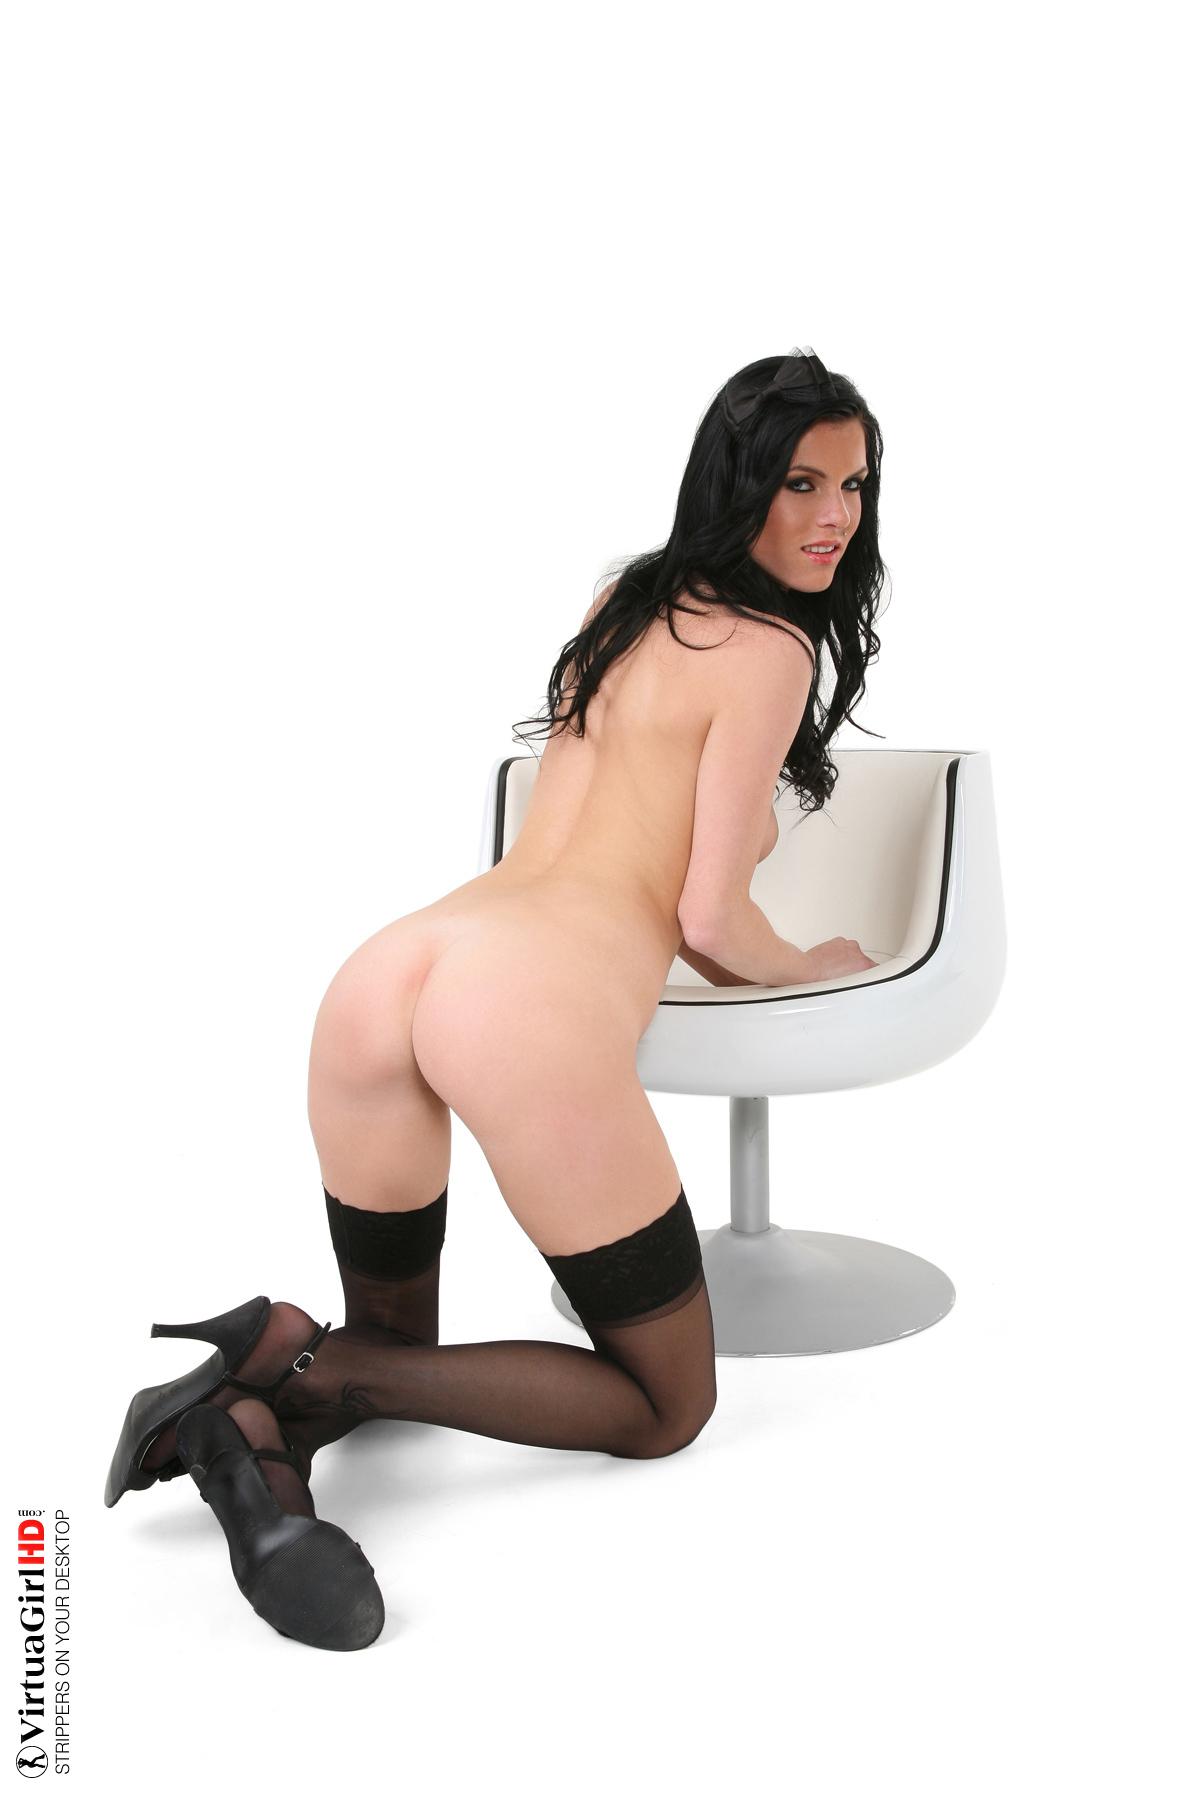 virtual girl desktop stripper crack